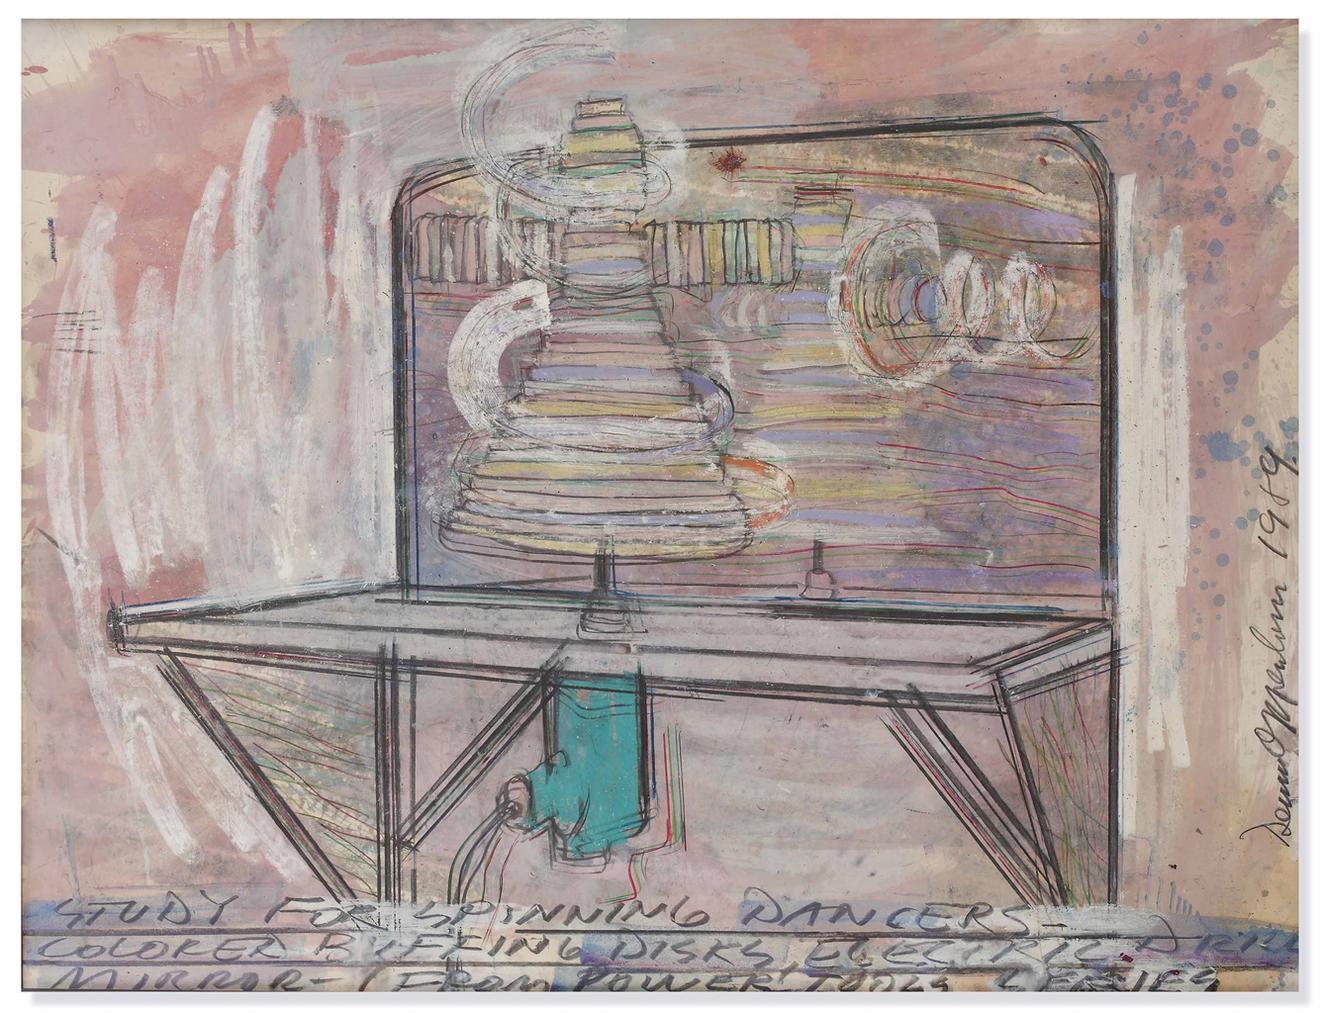 Dennis Oppenheim-Study For Spinning Dancers-1989